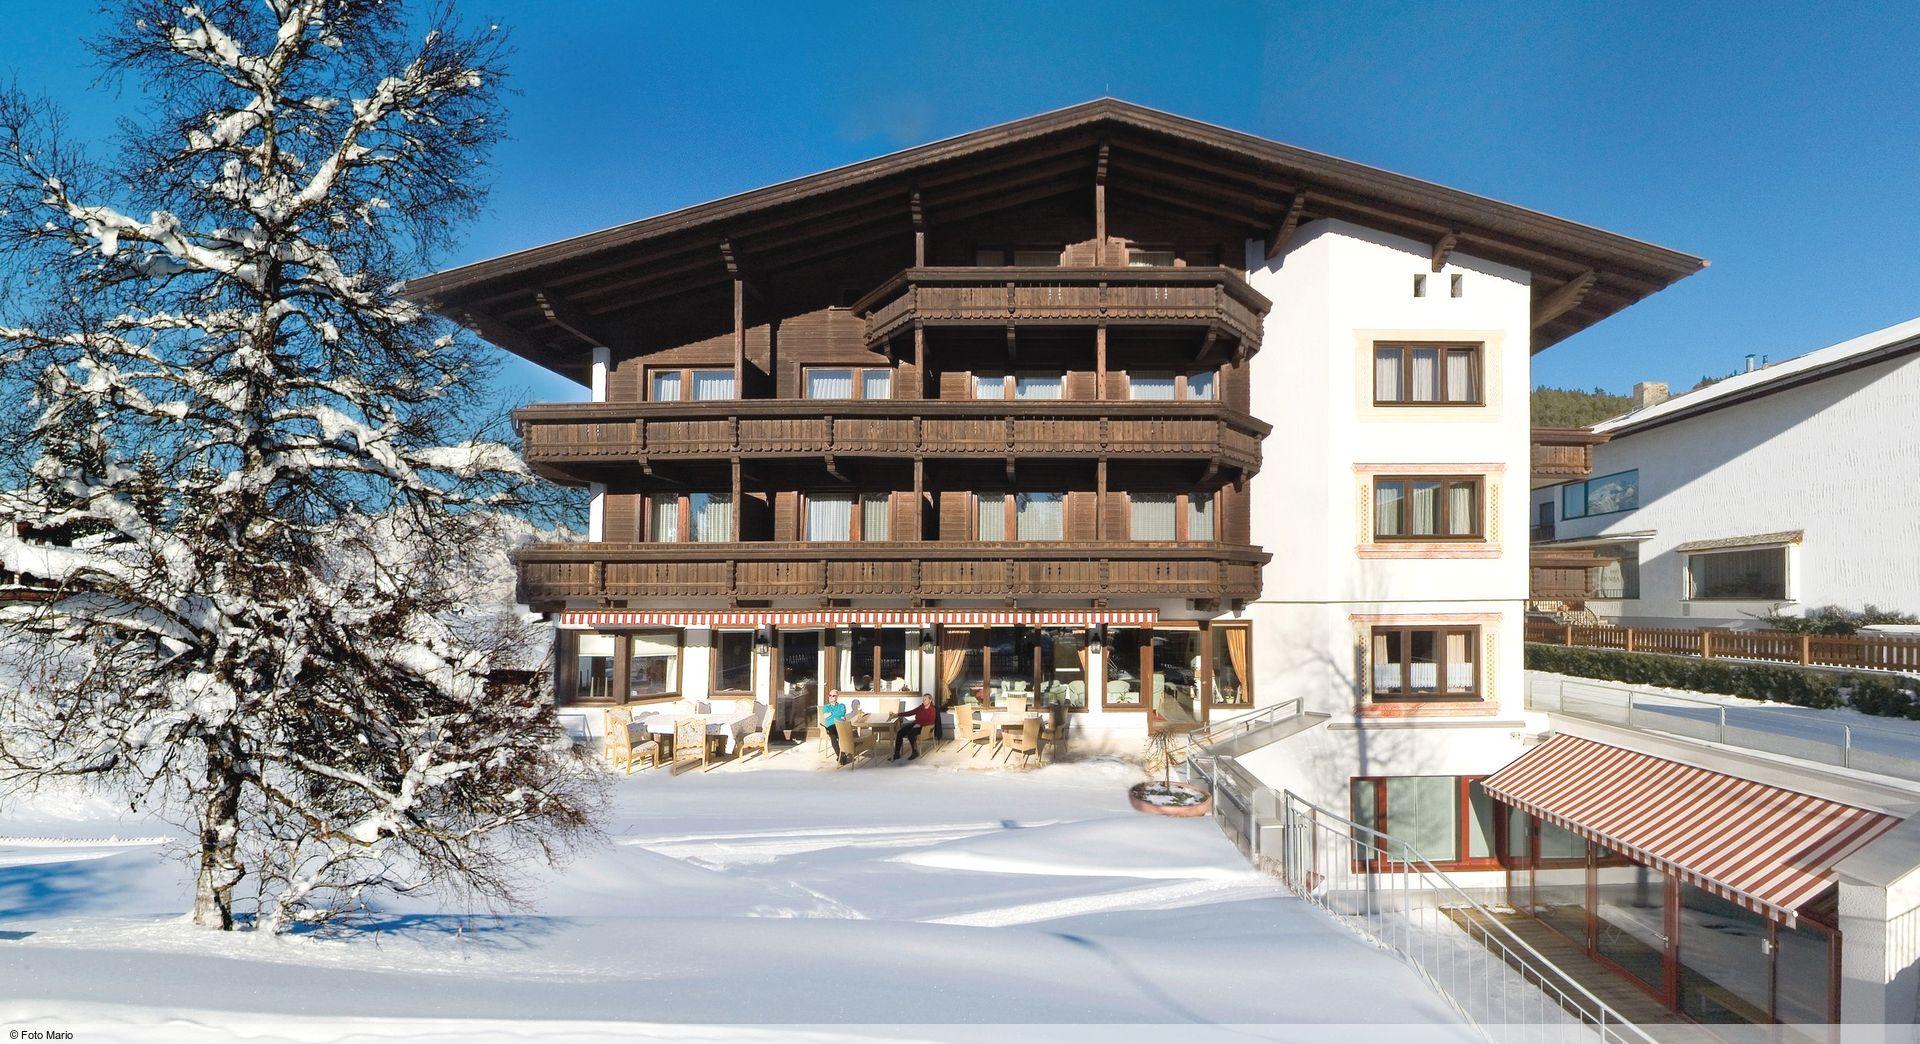 Hotel Seefeld - Hotel Solstein